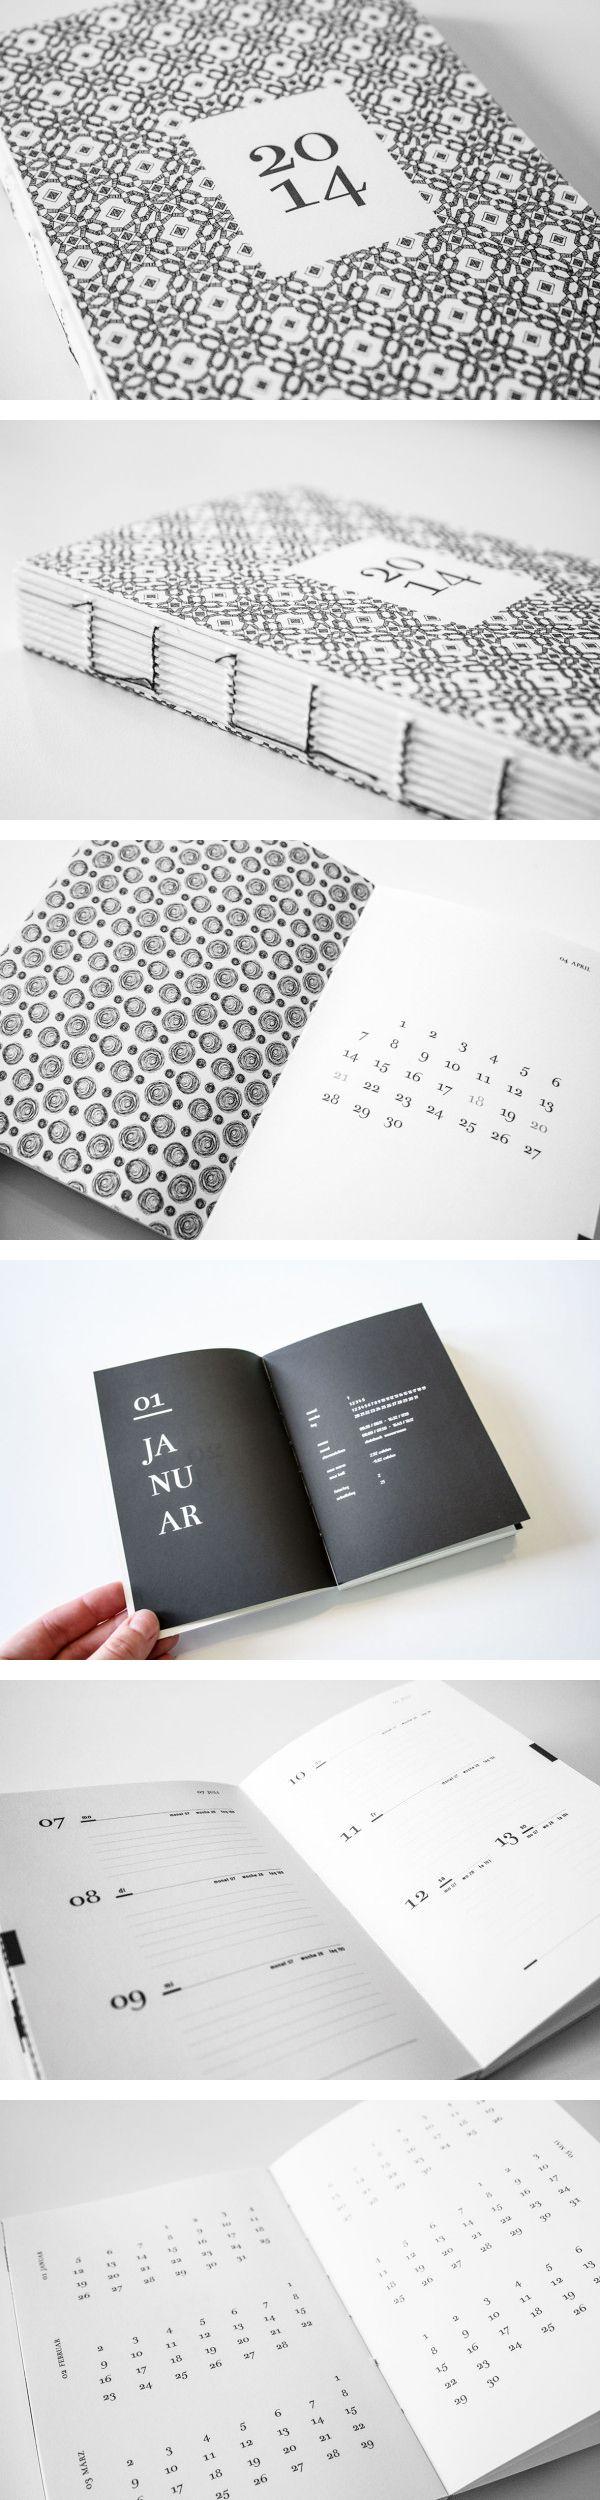 Design Calendar | Annkathrin Dahlhaus